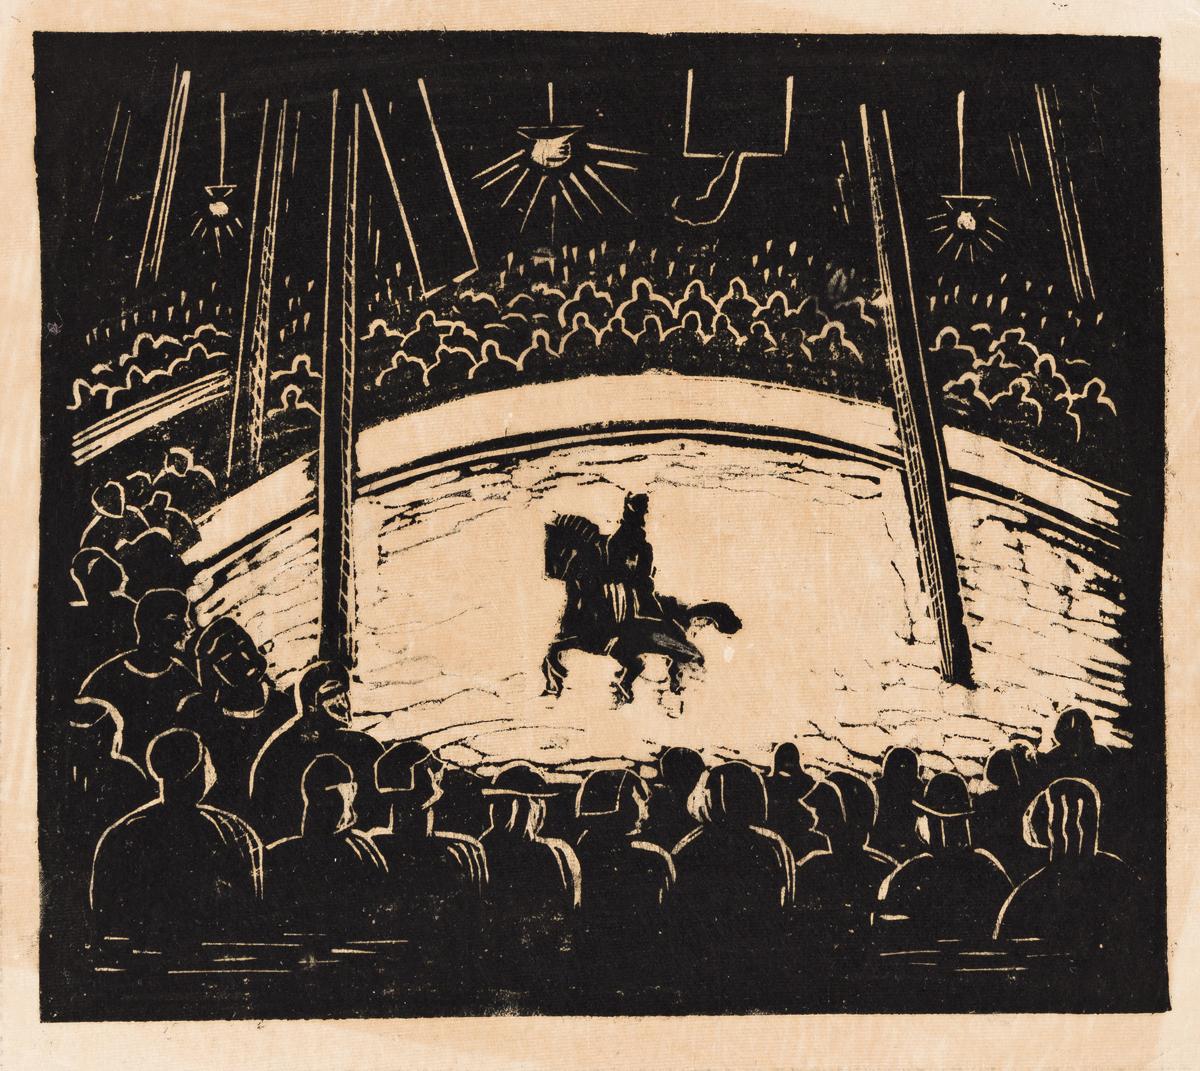 JAMES LESESNE WELLS (1902 - 1992) Circus.